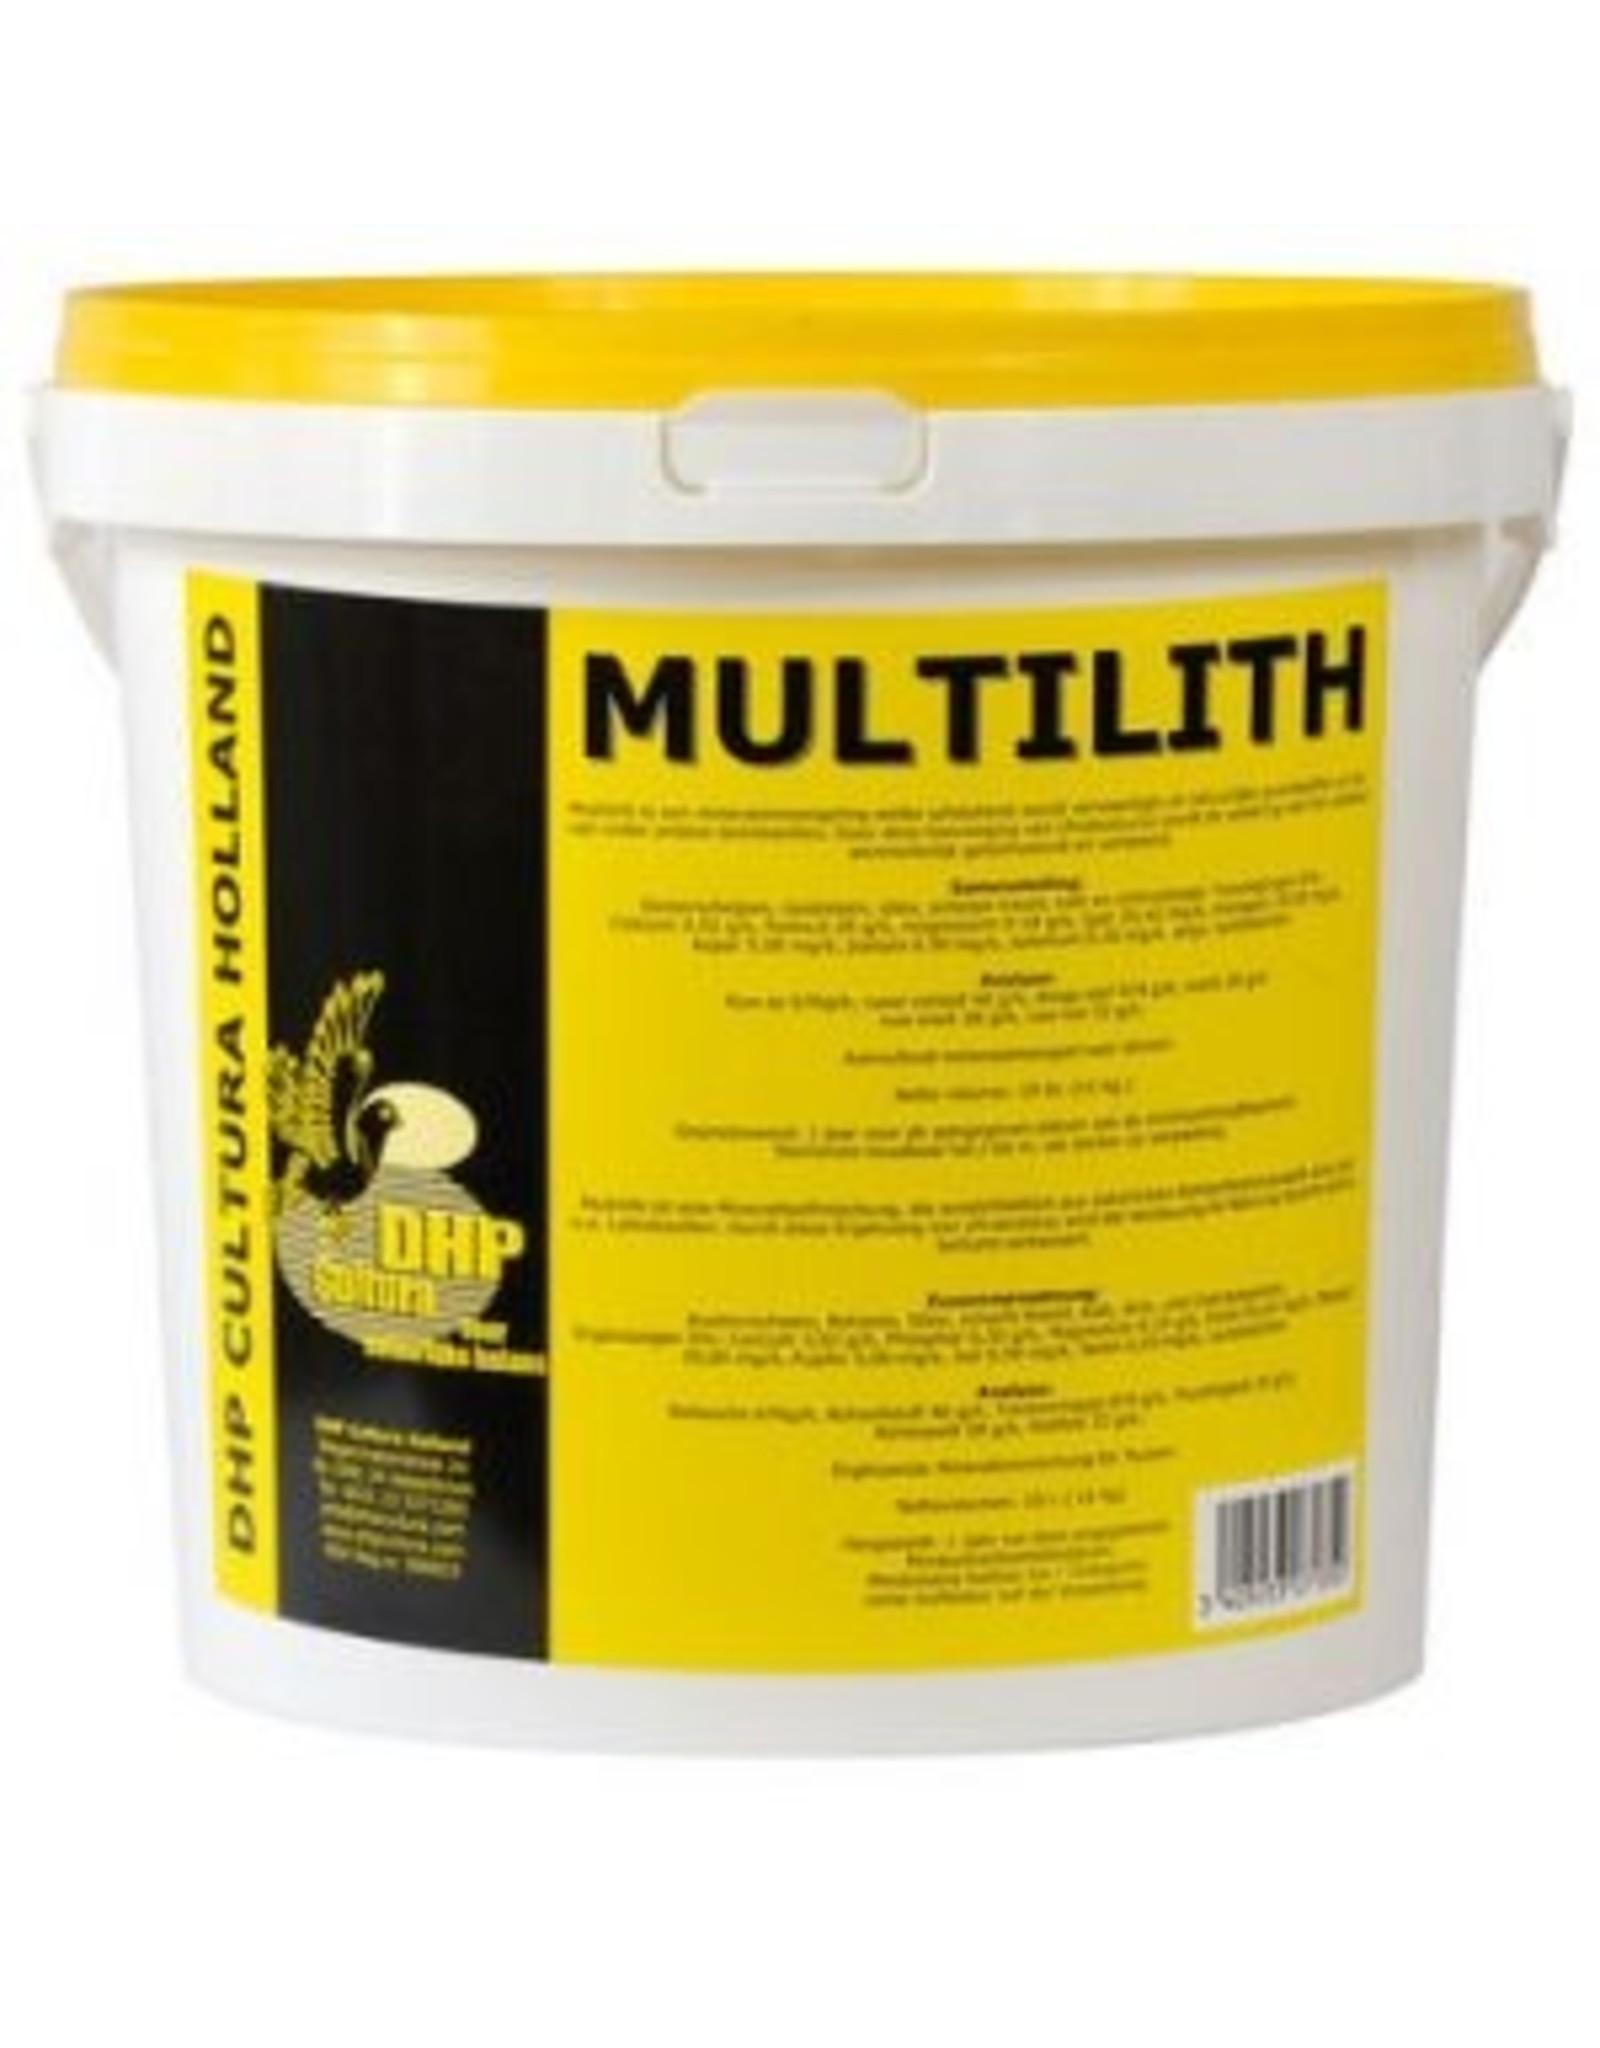 DHP Cultura Multilith - 10 Liter